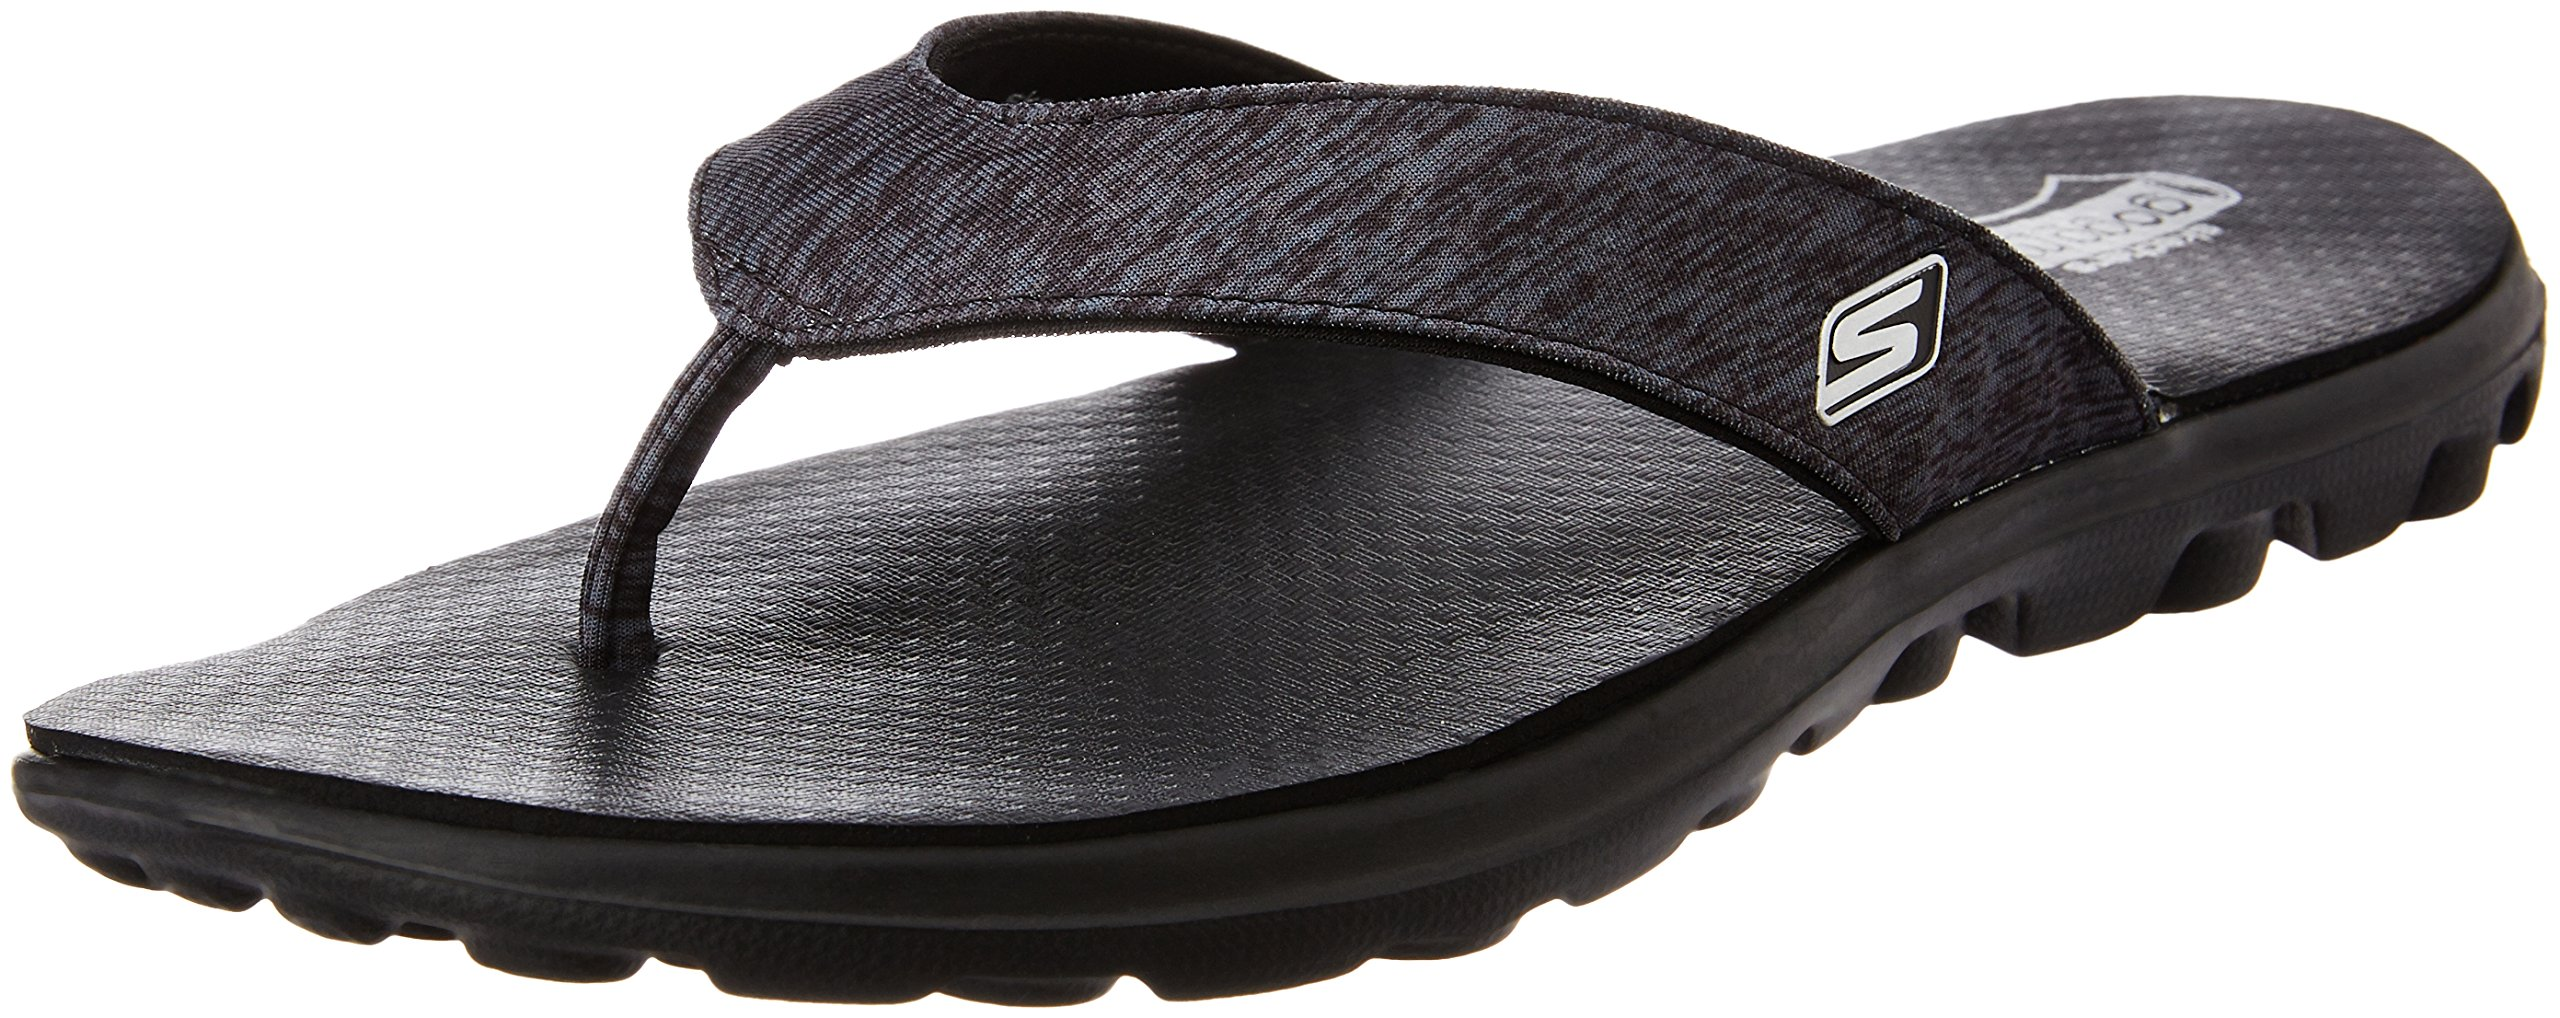 Skechers Womens on-the-GO Flow Thong Sandal Black 8 M US